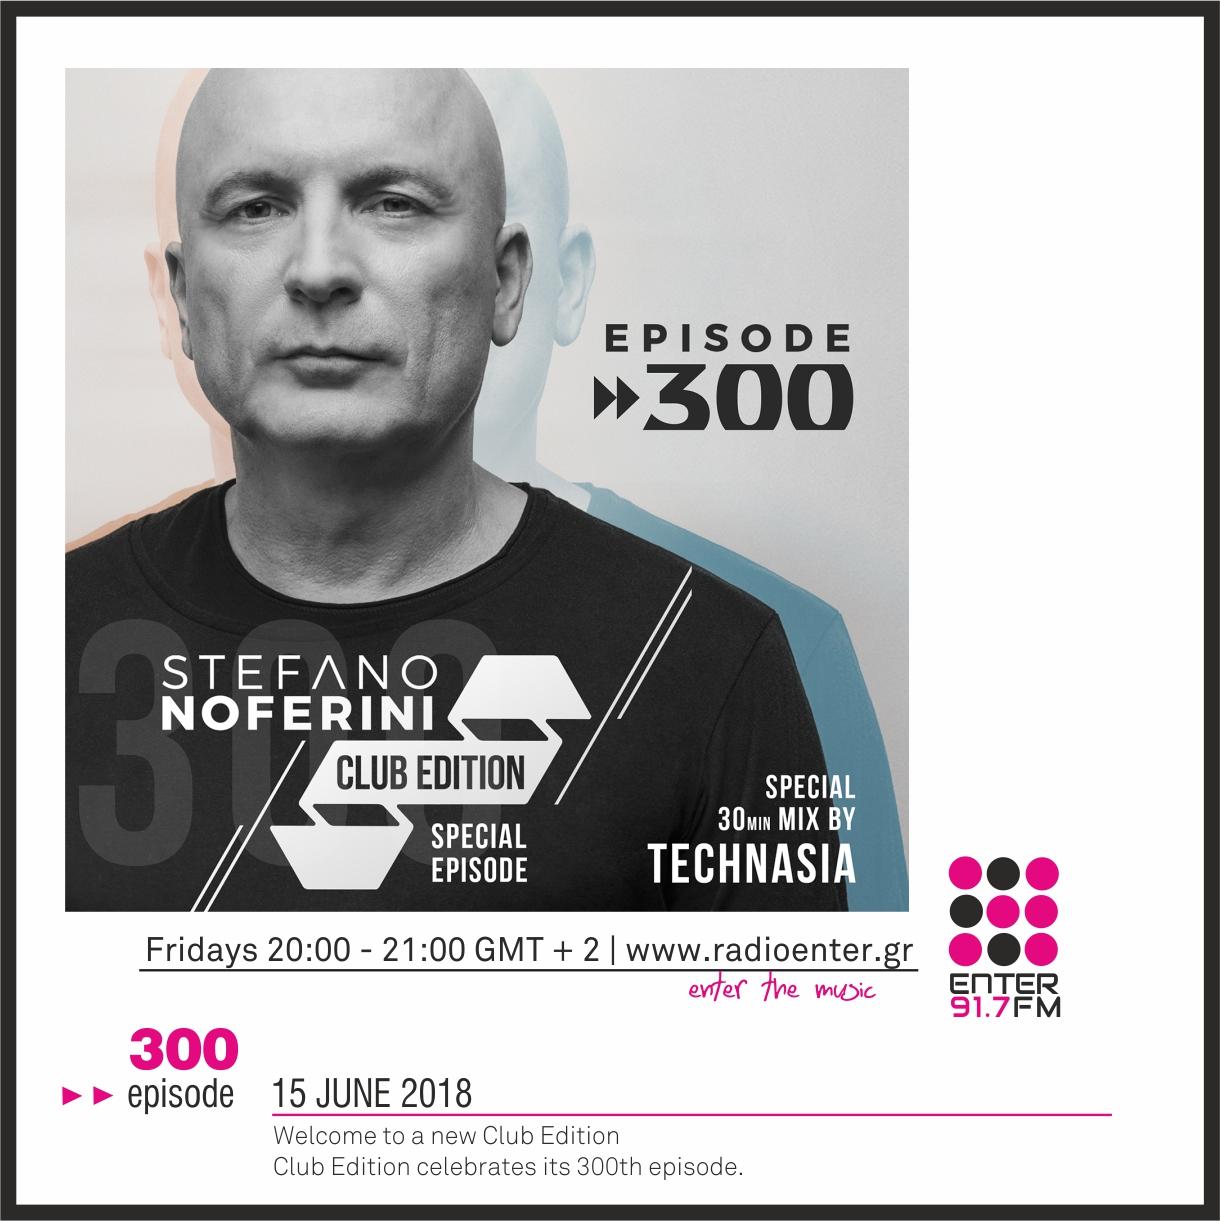 2018.06.29 - Stefano Noferini Club Edition 300